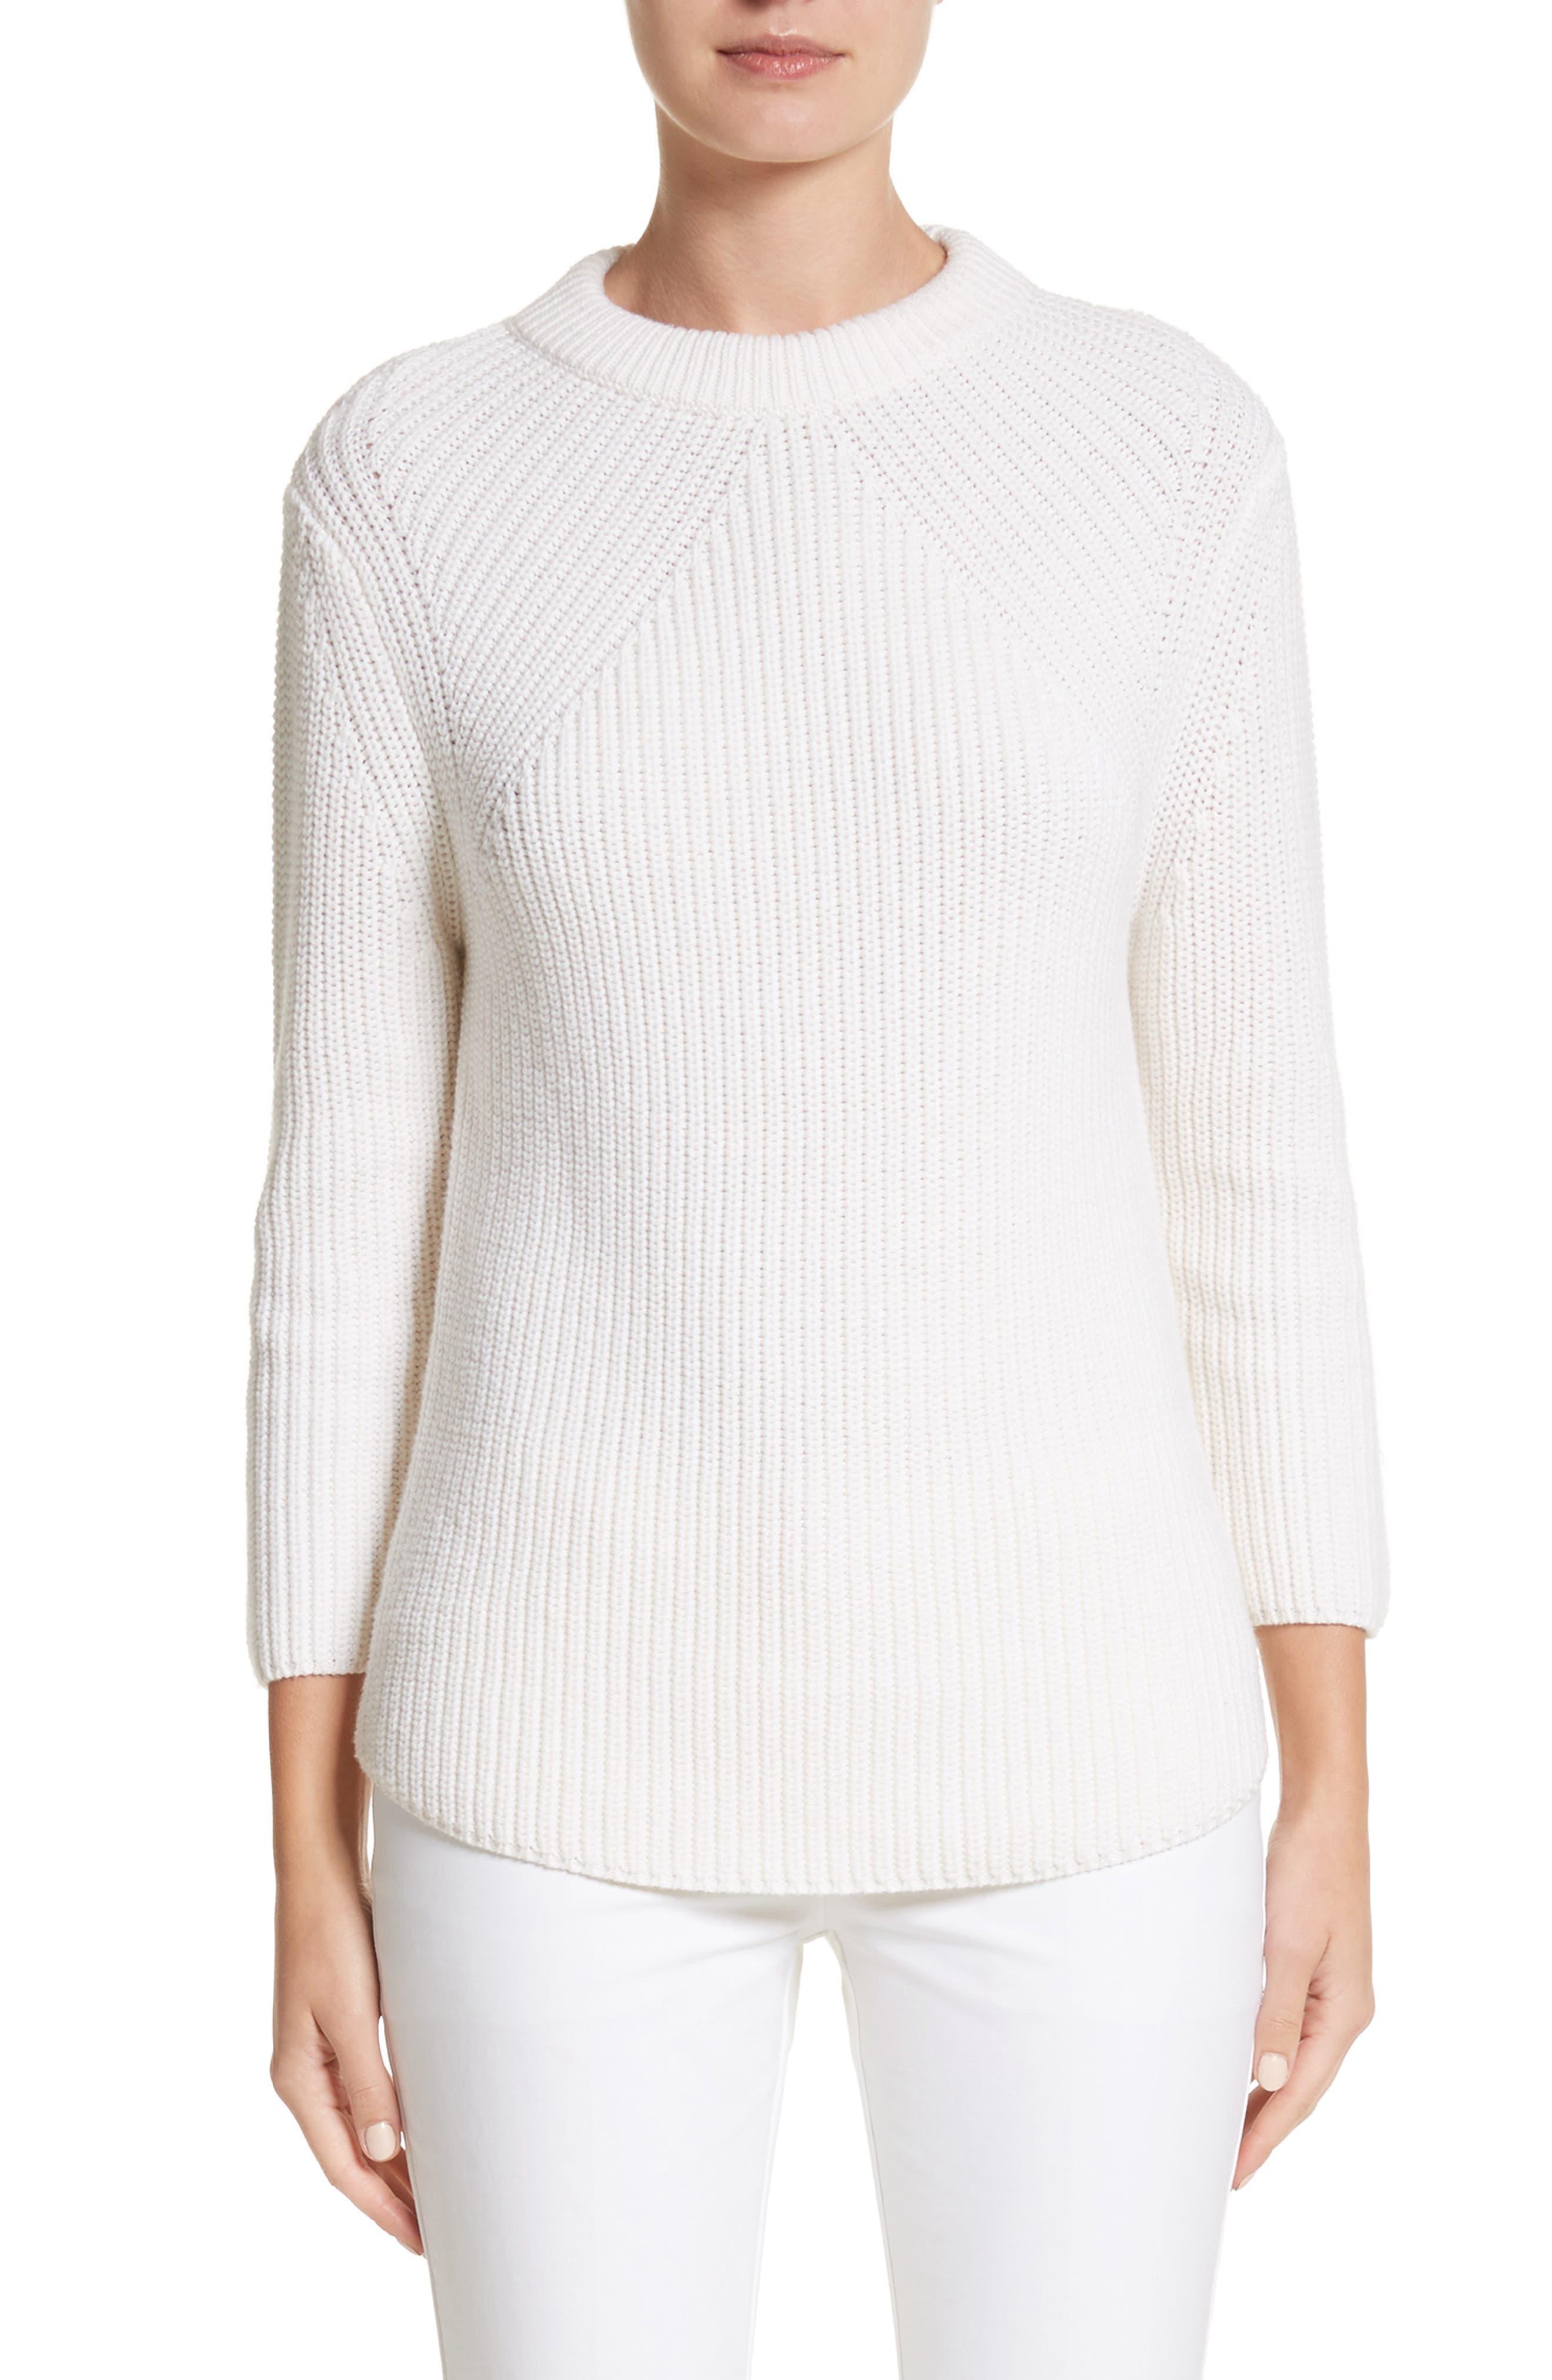 Alternate Image 1 Selected - Michael Kors Merino Wool & Cotton Pullover